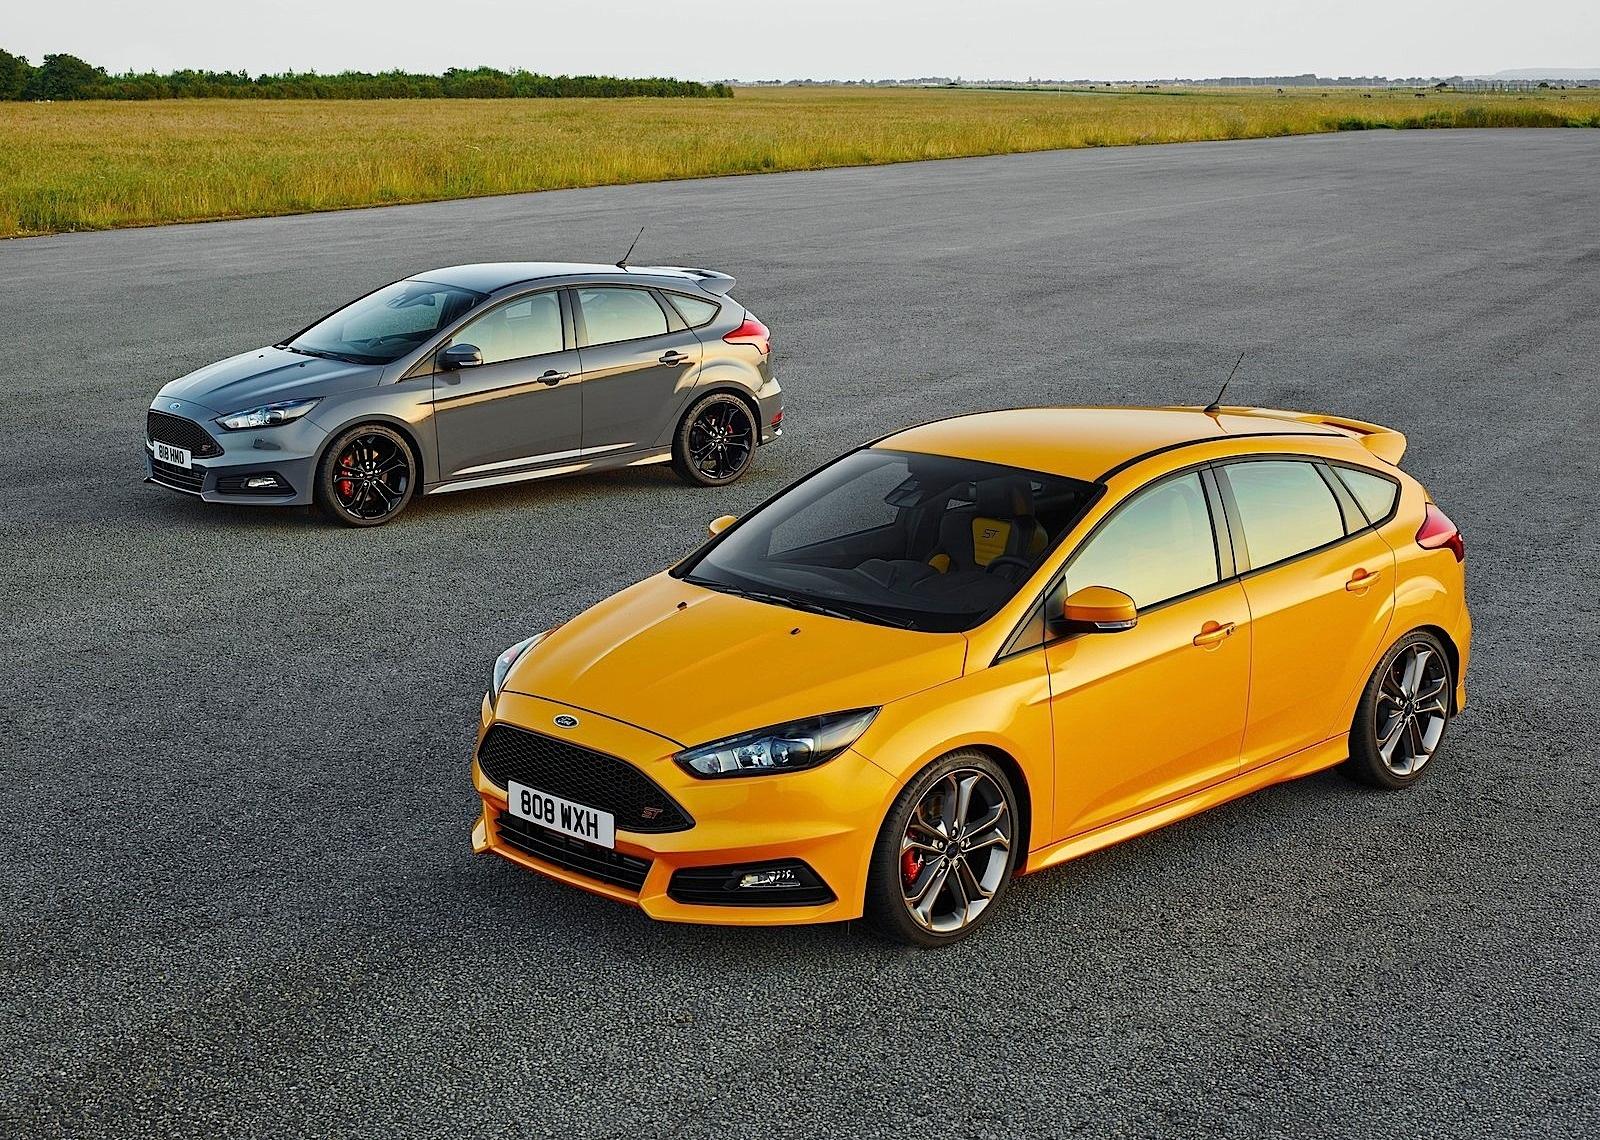 Ford focus st 5 doors 2014 present